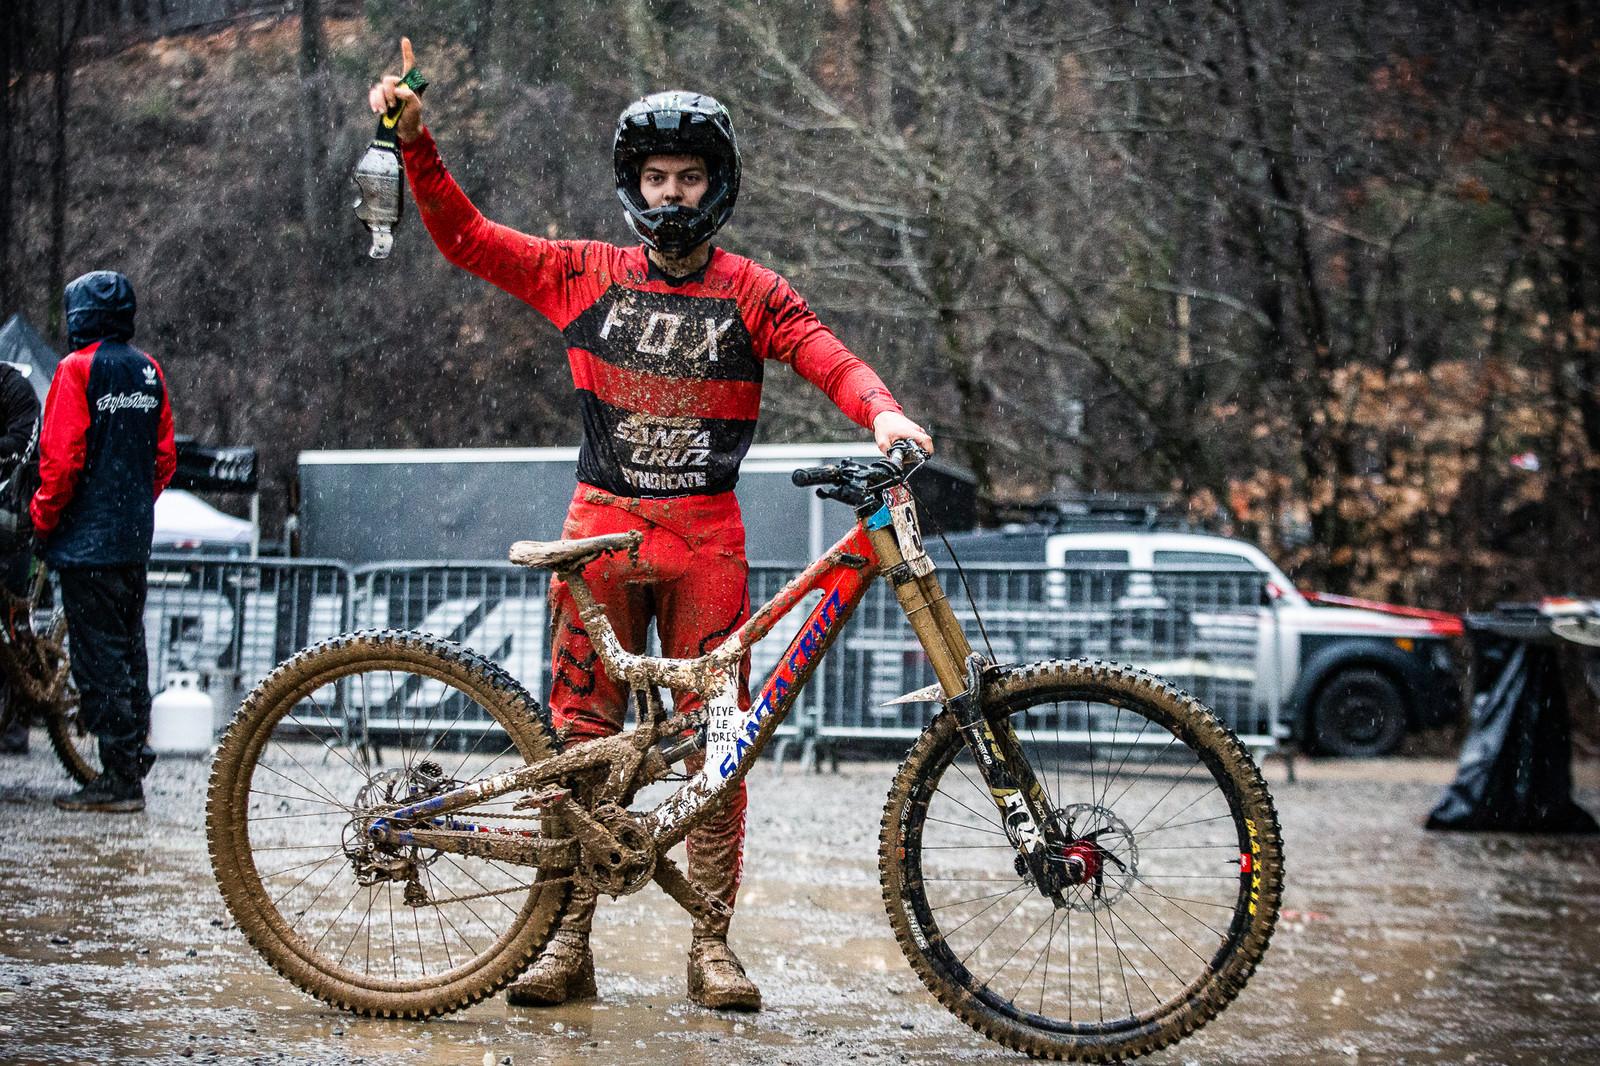 WINNING BIKE: Loris Vergier's Santa Cruz V10cc 29 from Windrock Pro GRT - 2019 WINNING BIKES - Mountain Biking Pictures - Vital MTB